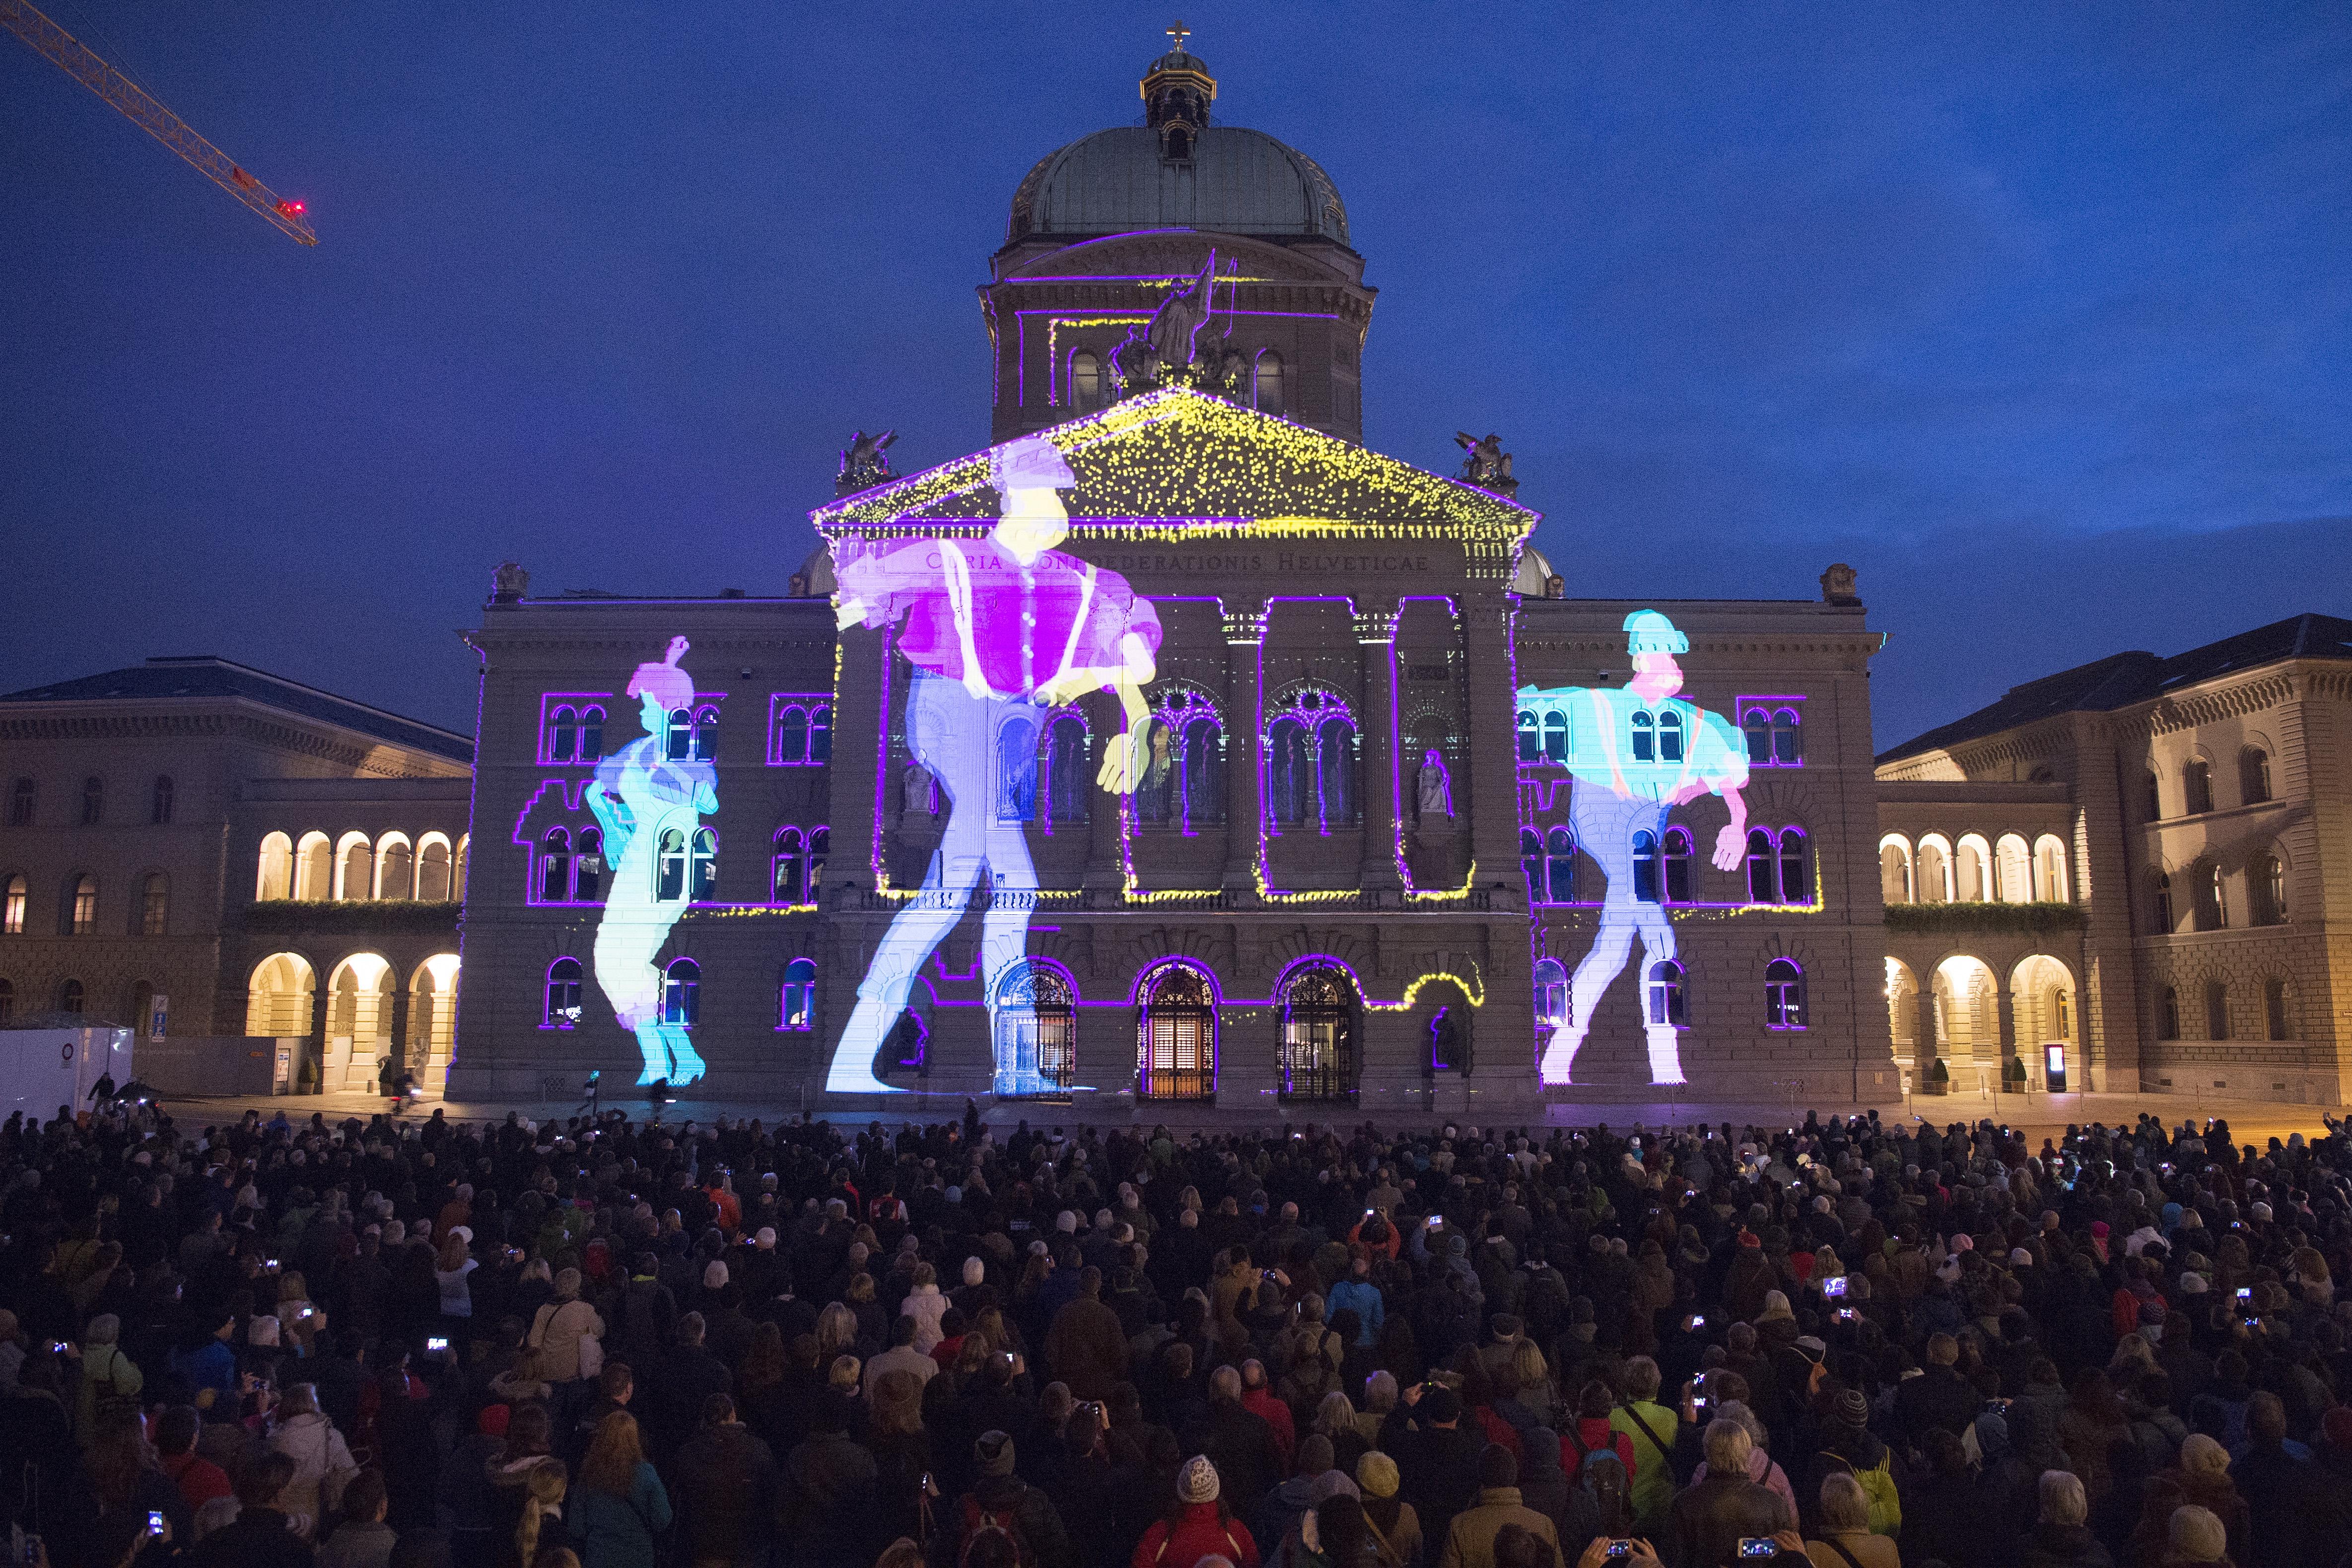 Bundeshaus Beleuchtung 2016 | Great Bundeshaus Beleuchtung 2016 Pictures Lichtshow Bundeshaus